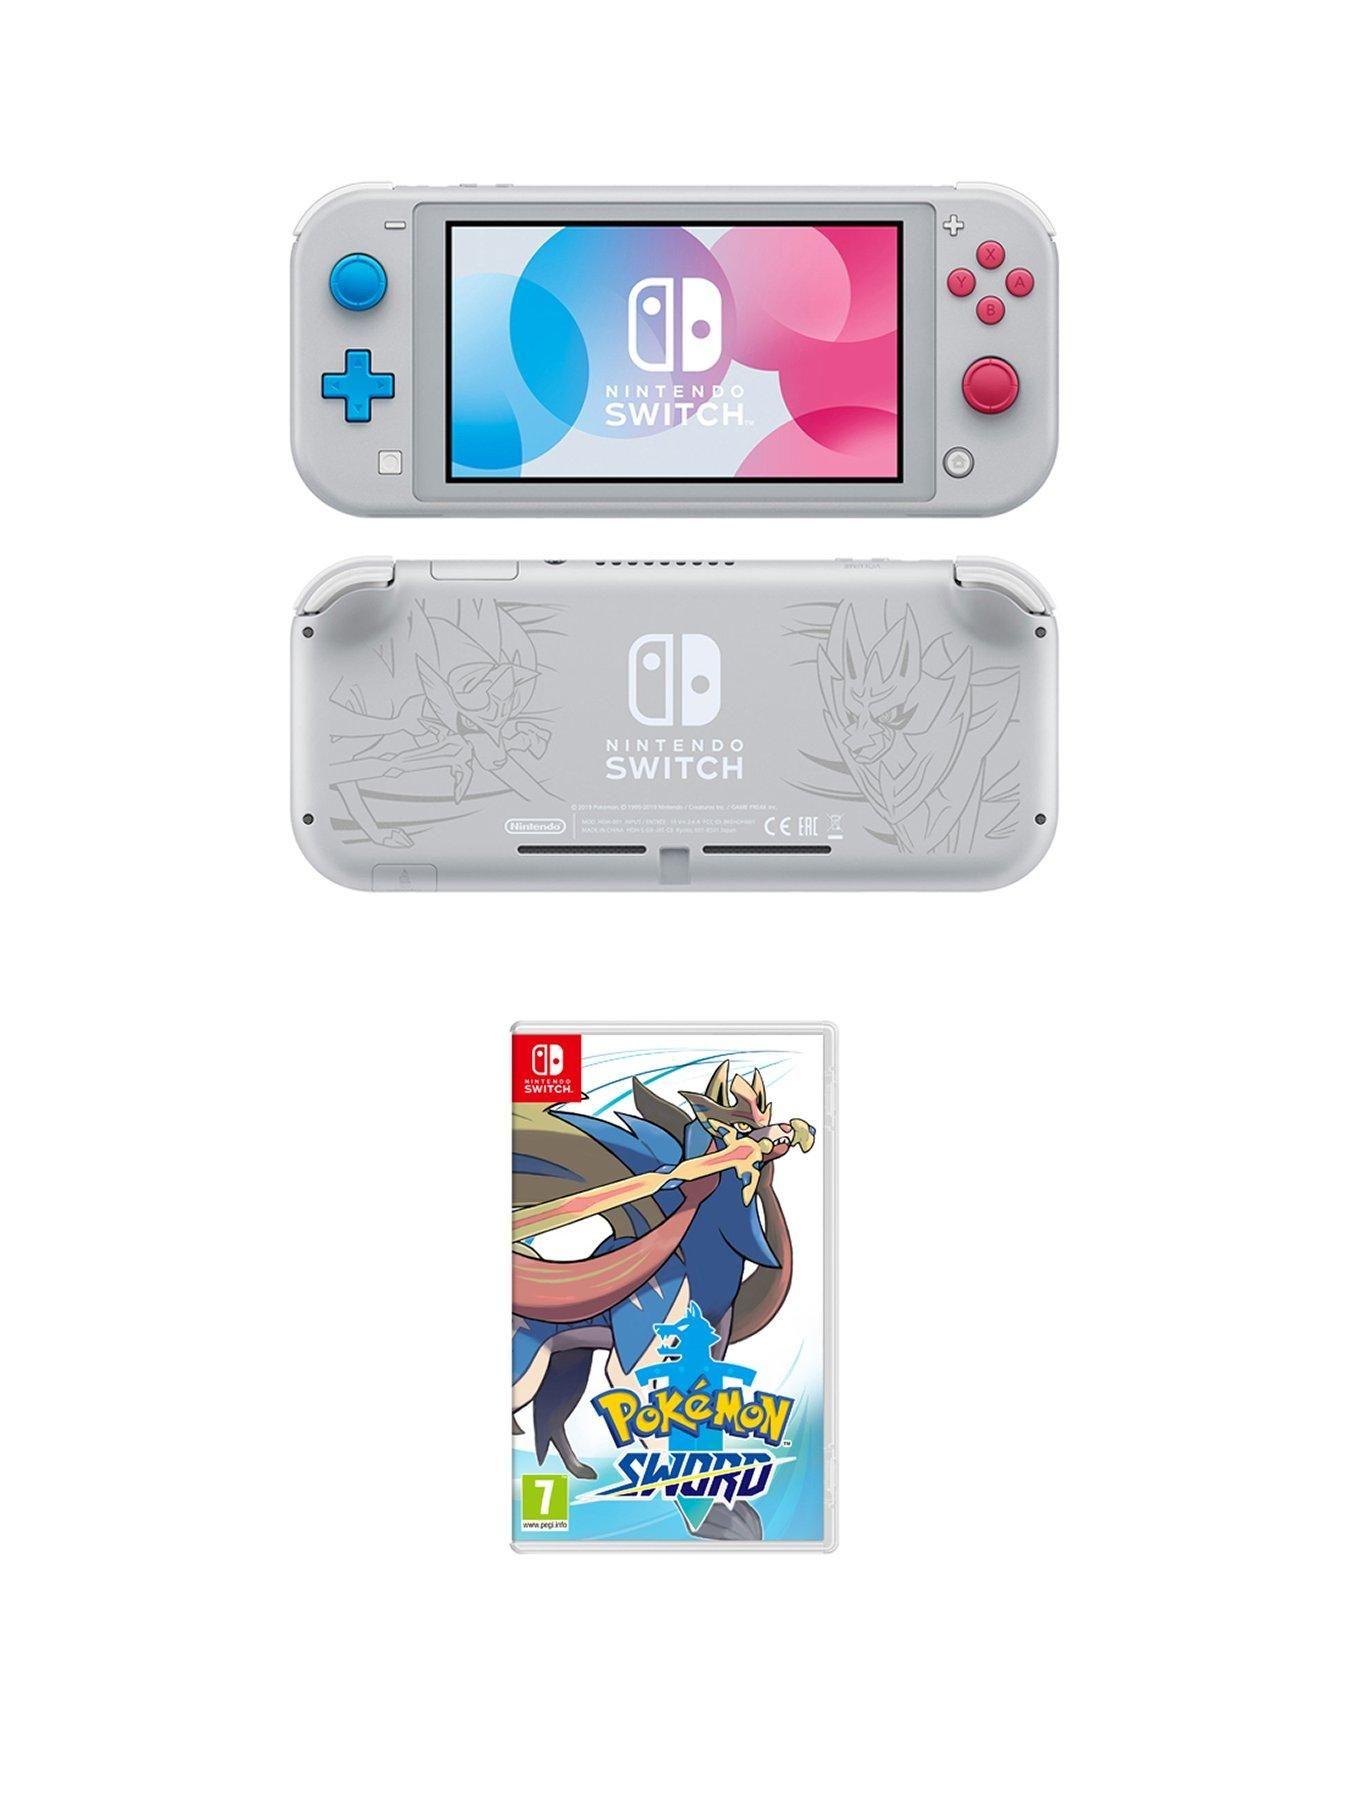 Nintendo Switch Lite Nintendo Switch Lite Zacian And Zamazenta Console With Pokemon Sword In One Colour In 2020 Nintendo Switch Nintendo Switch Games Nintendo